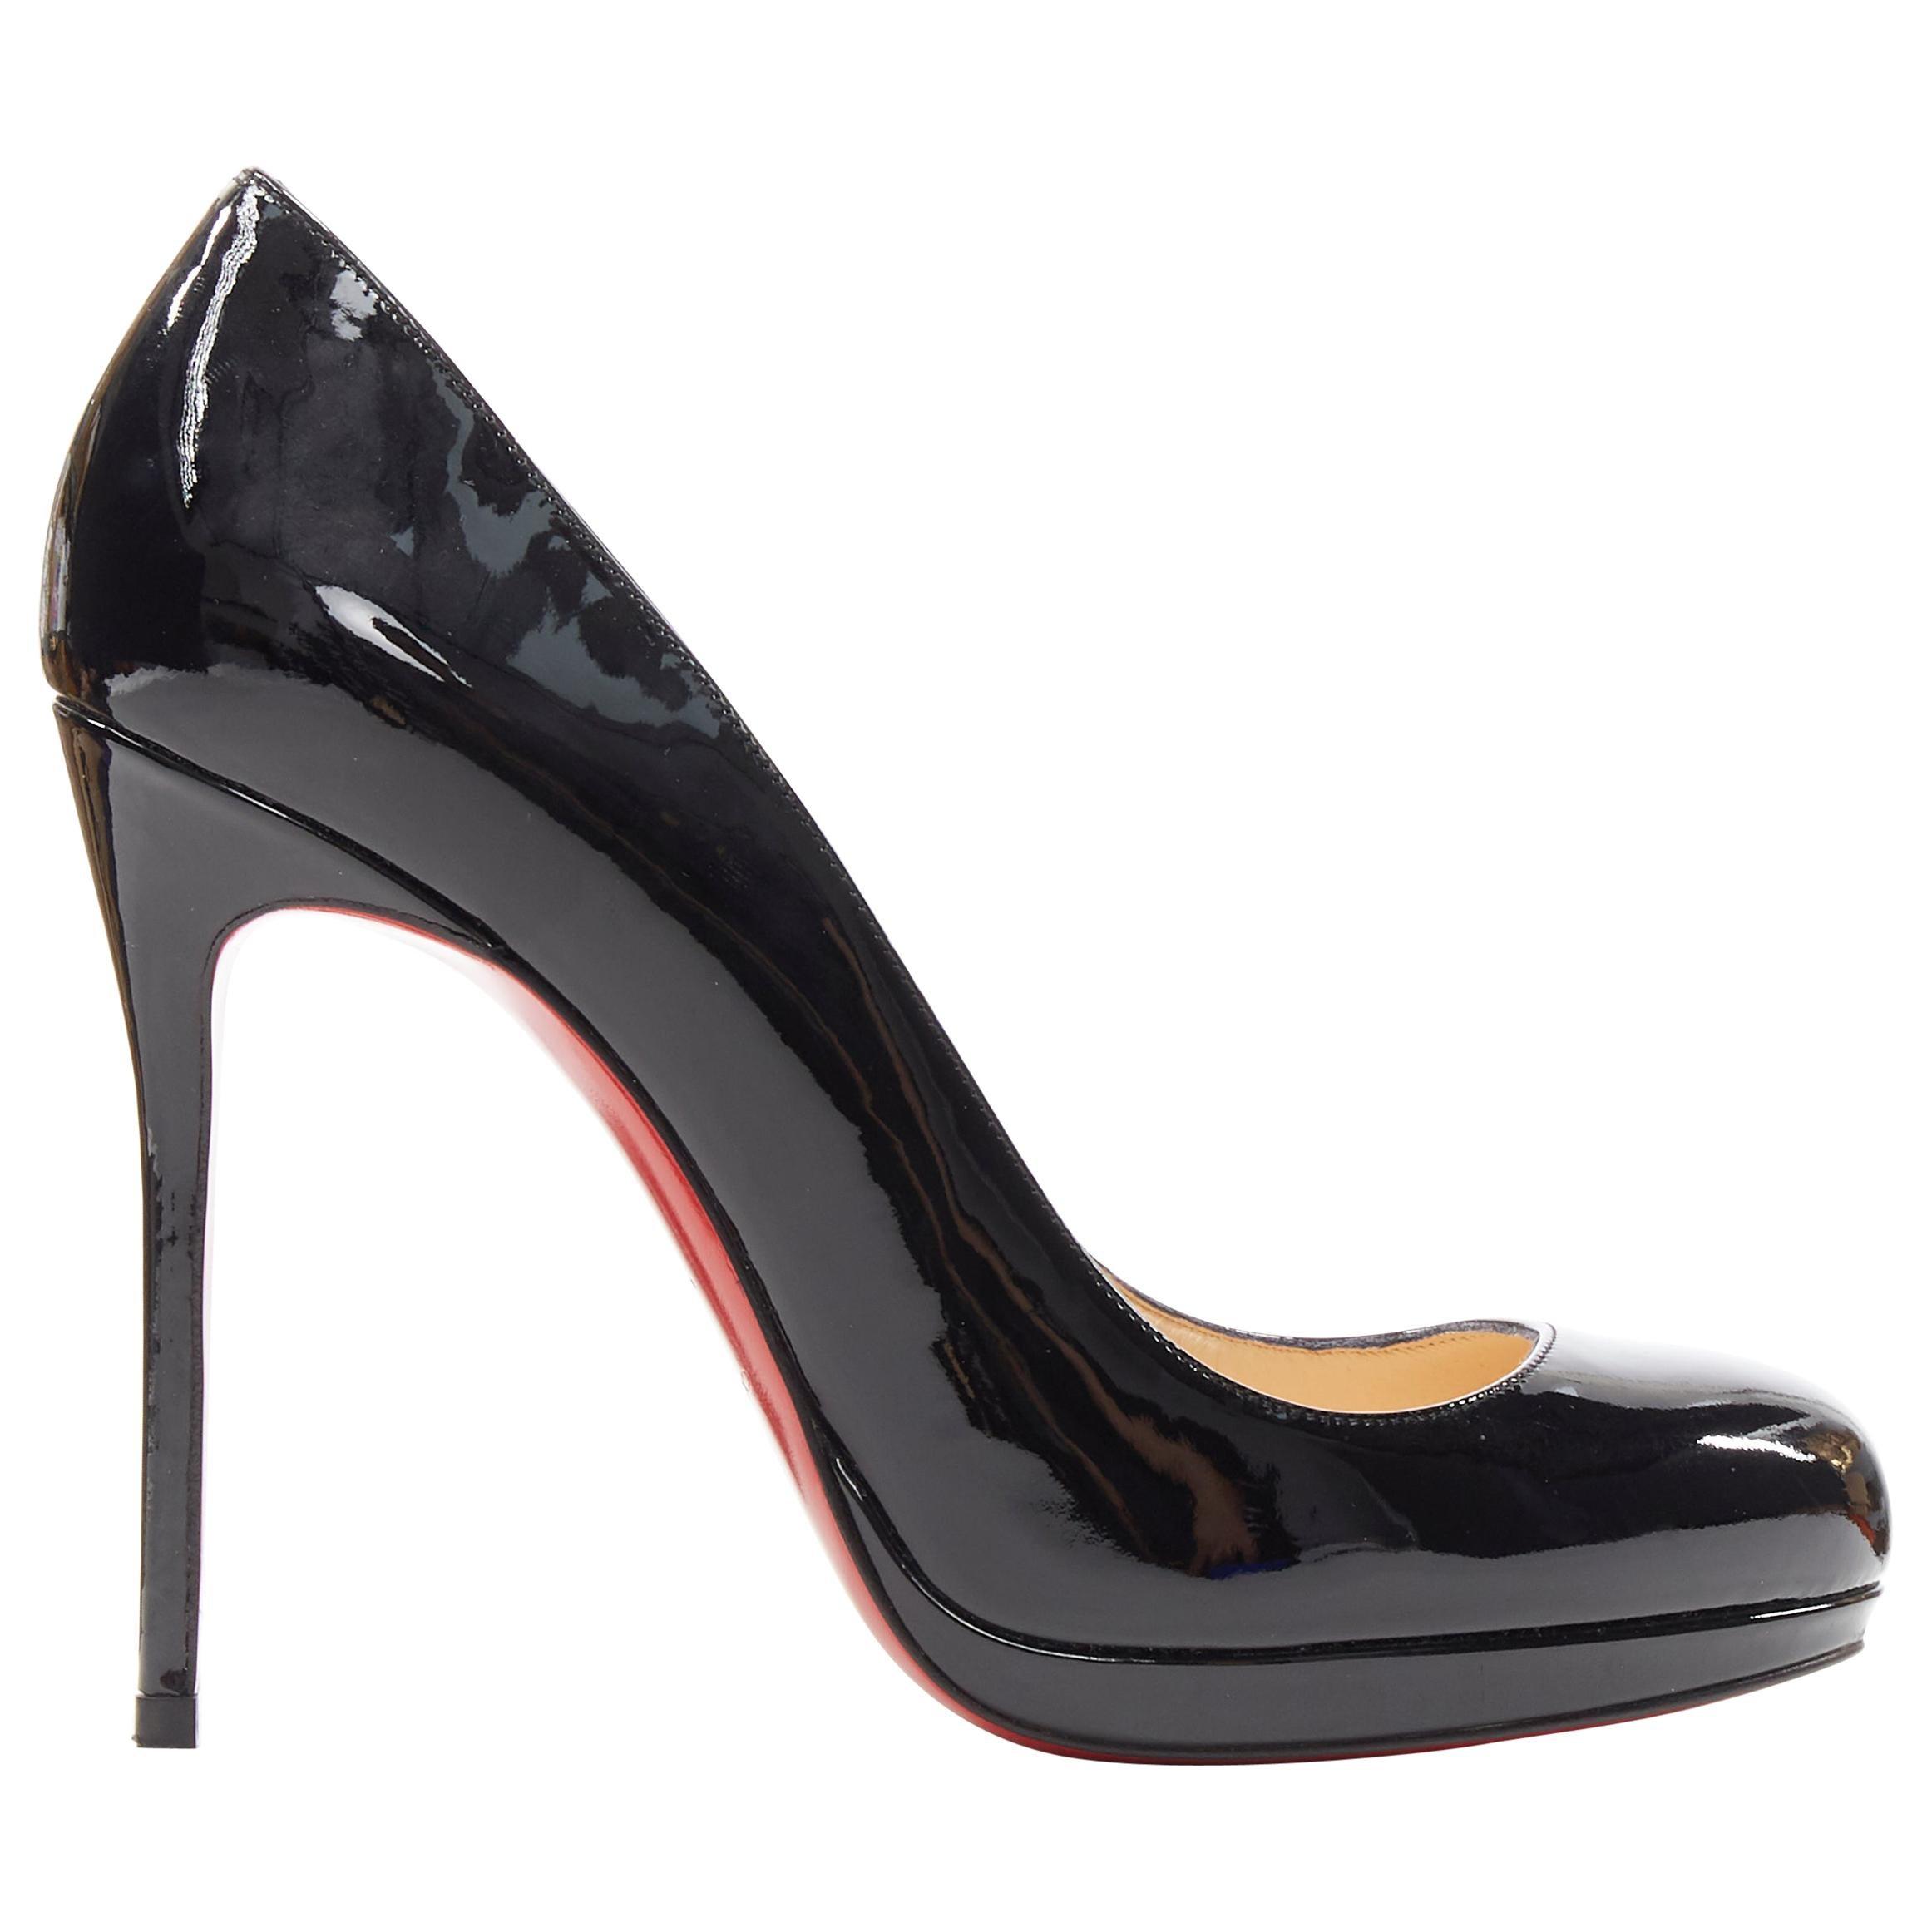 CHRISTIAN LOUBOUTIN black patent round toe platform high heel pump EU37.5